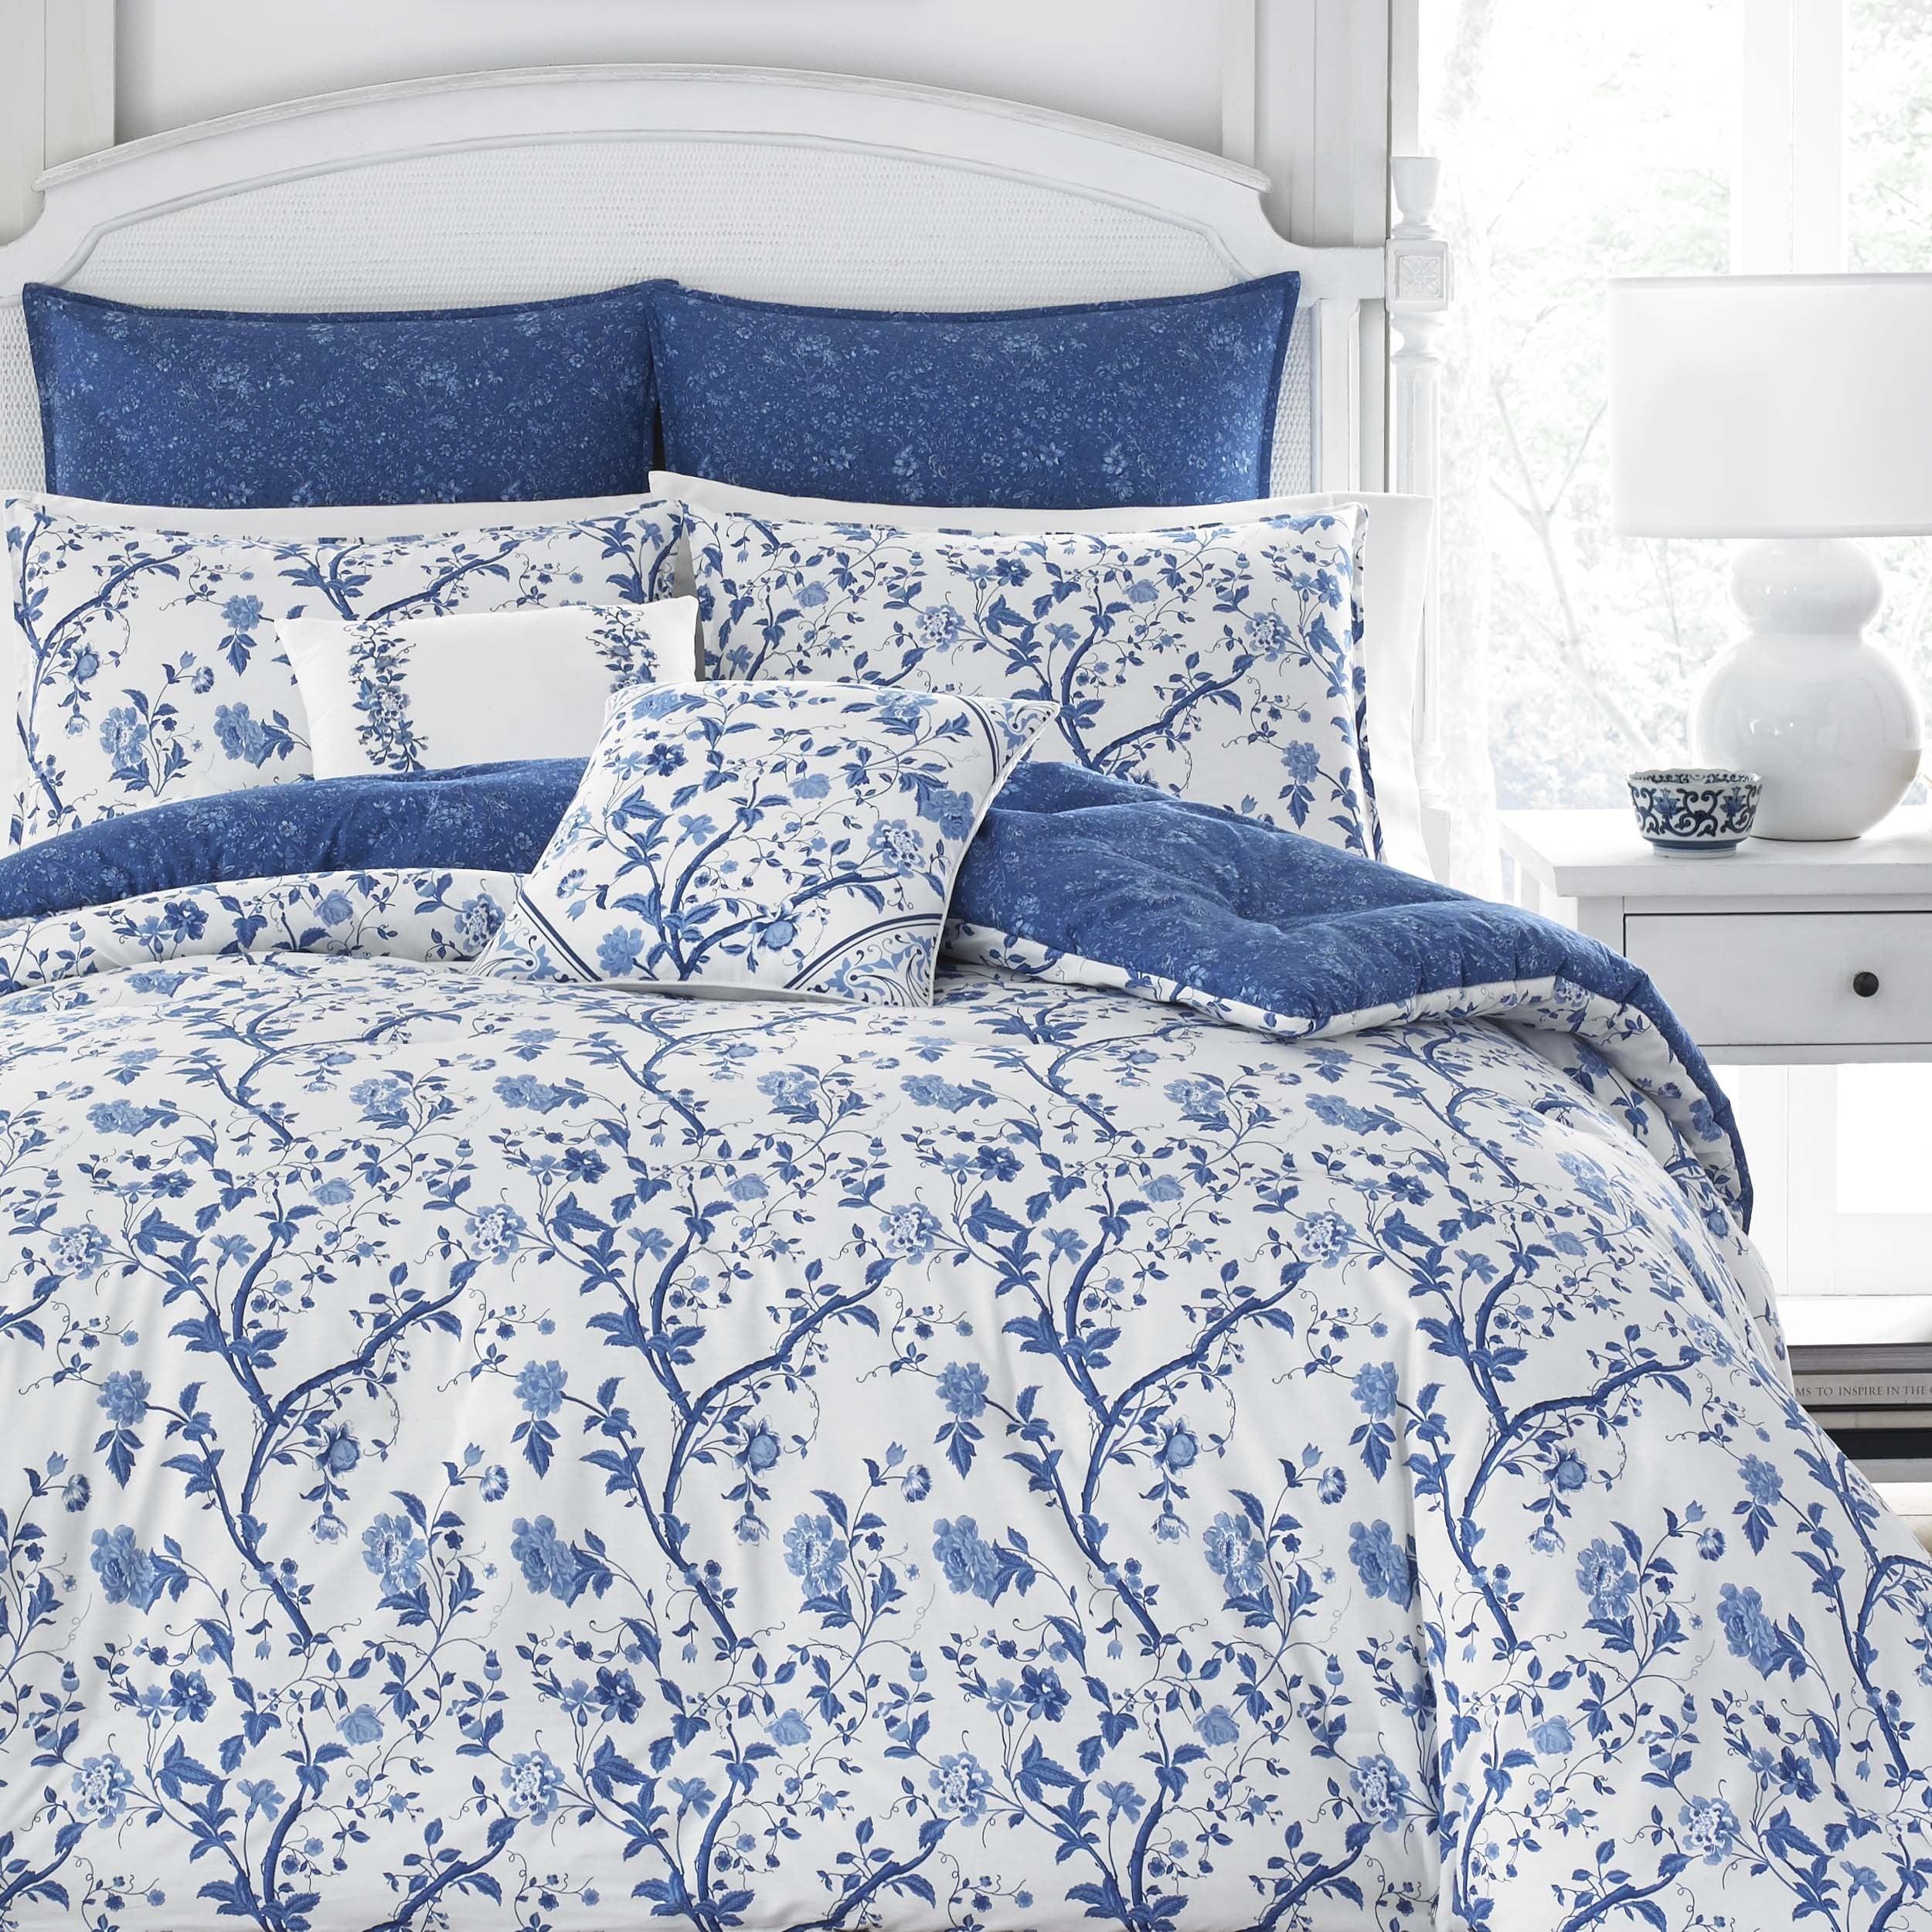 Shop Laura Ashley Elise Navy Floral 7 piece Comforter Set   On